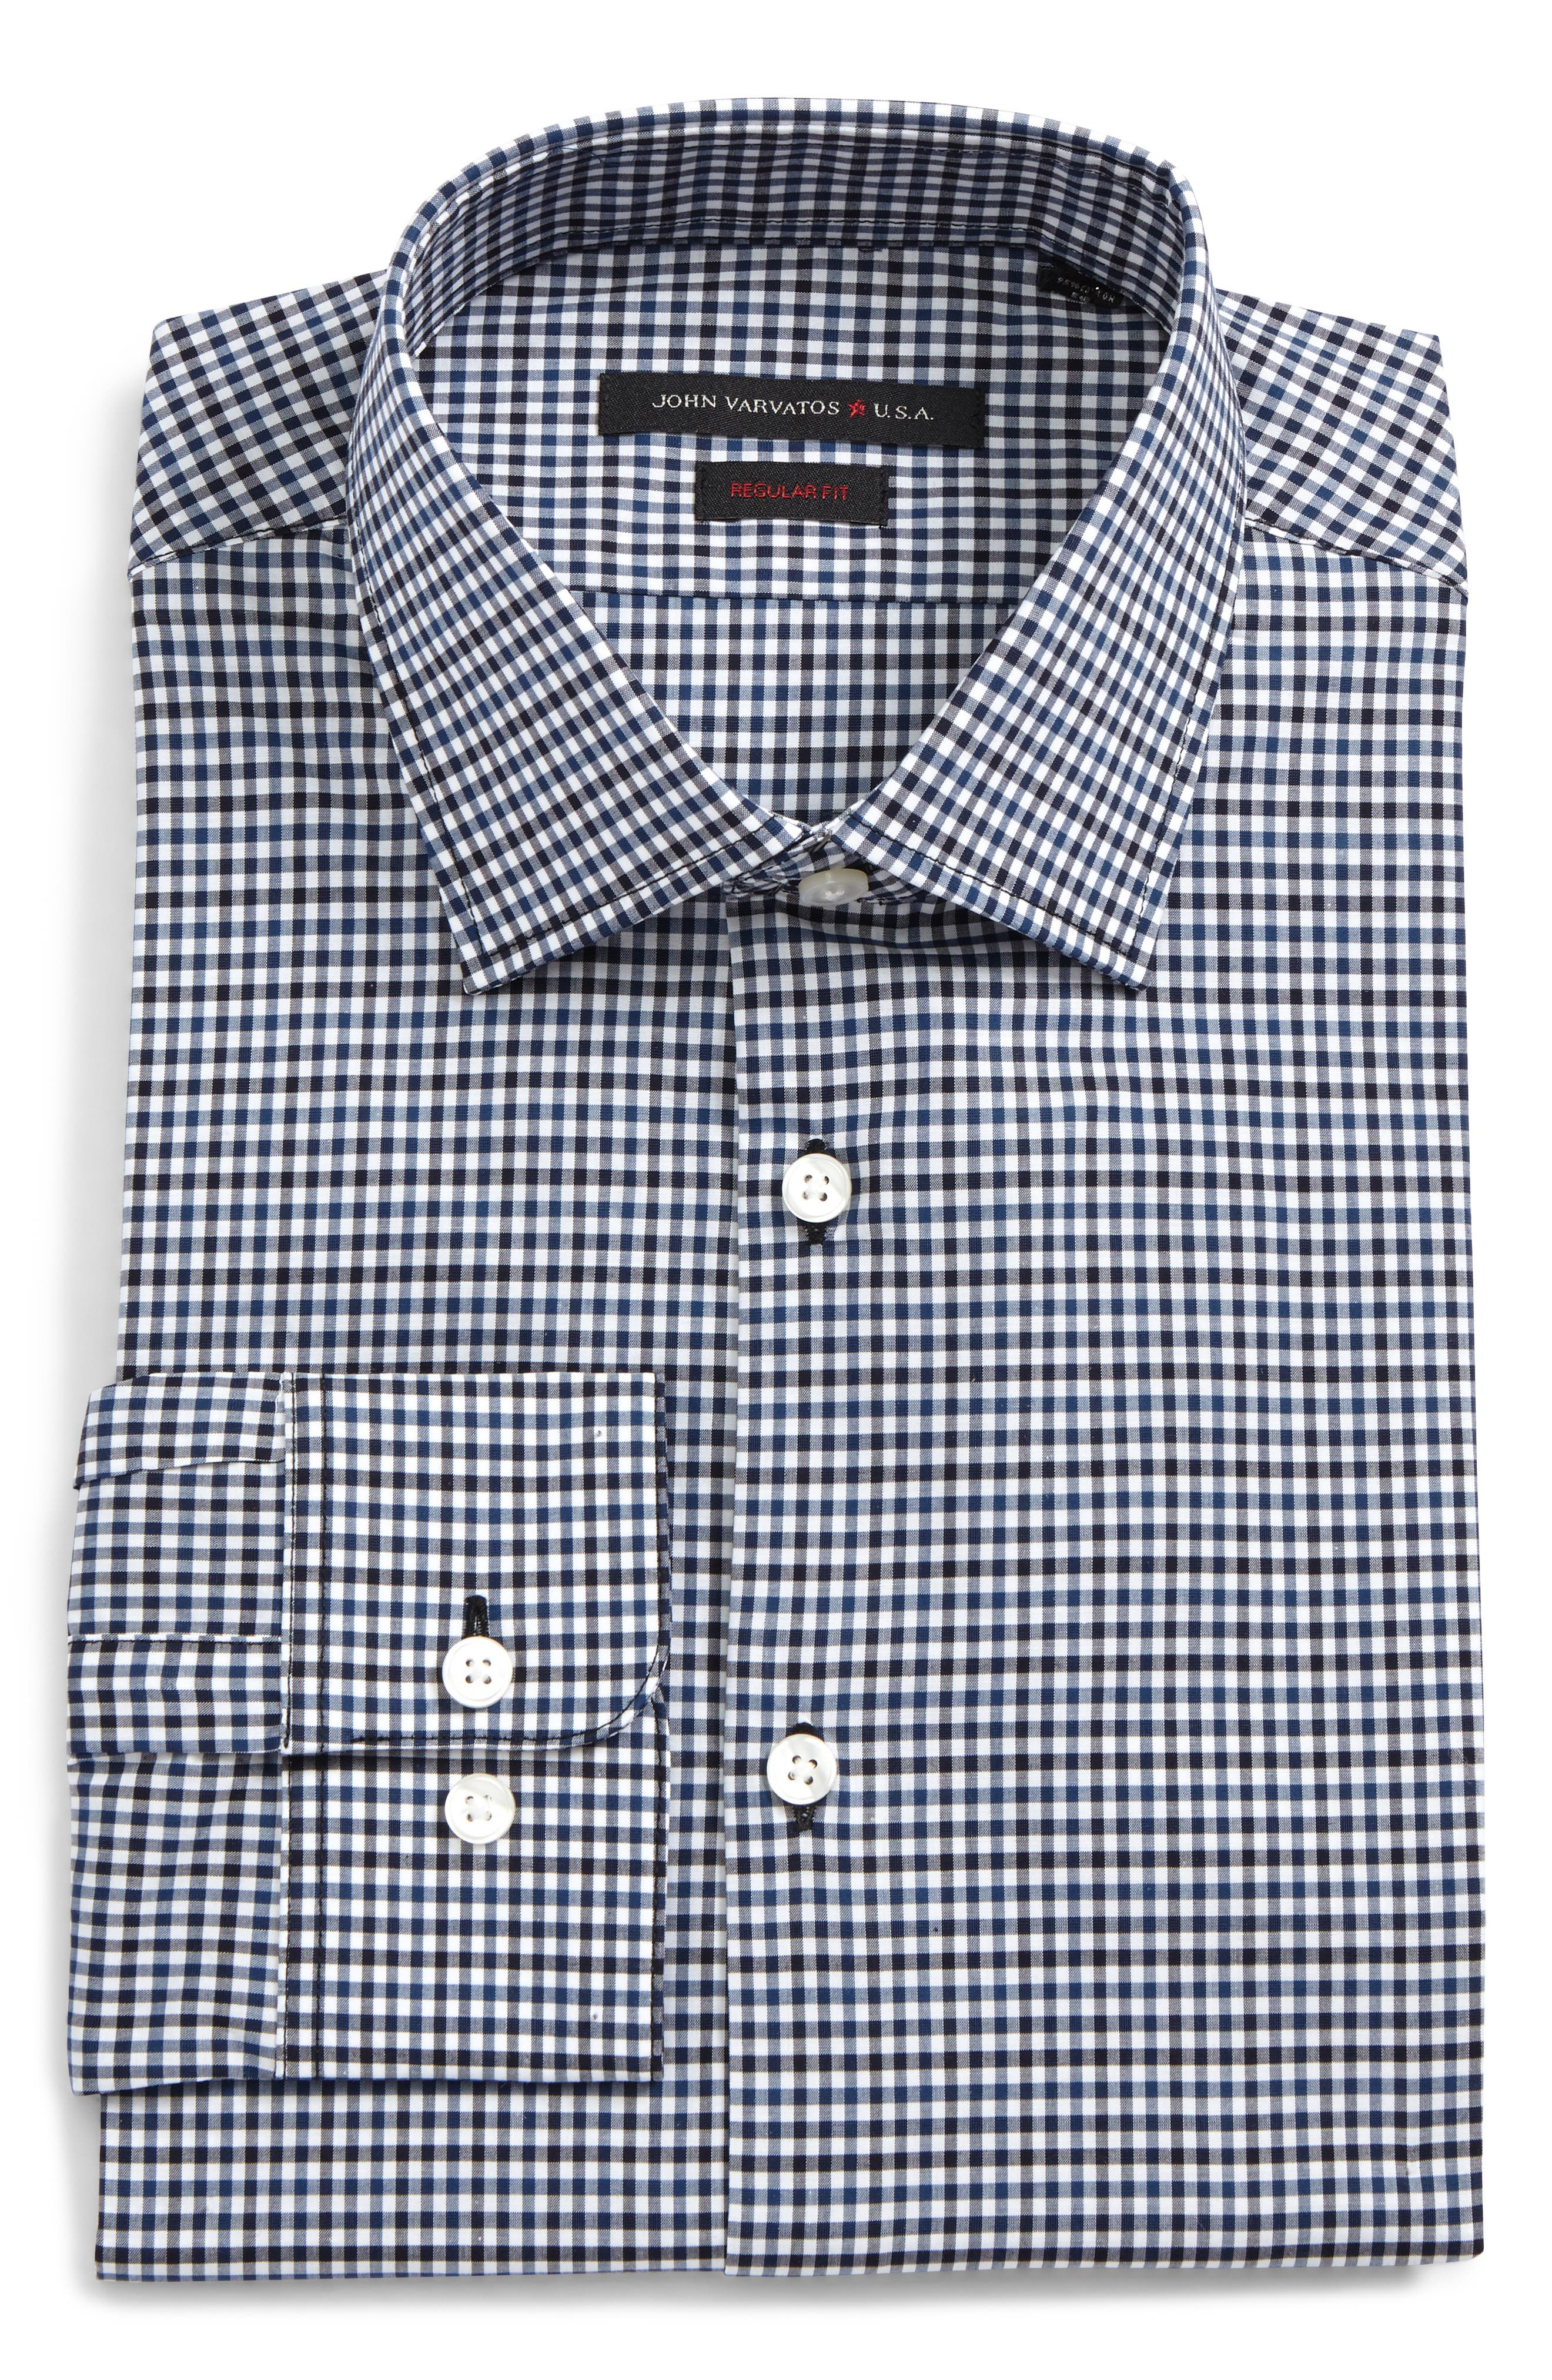 Regular Fit Stretch Check Dress Shirt,                             Main thumbnail 1, color,                             412